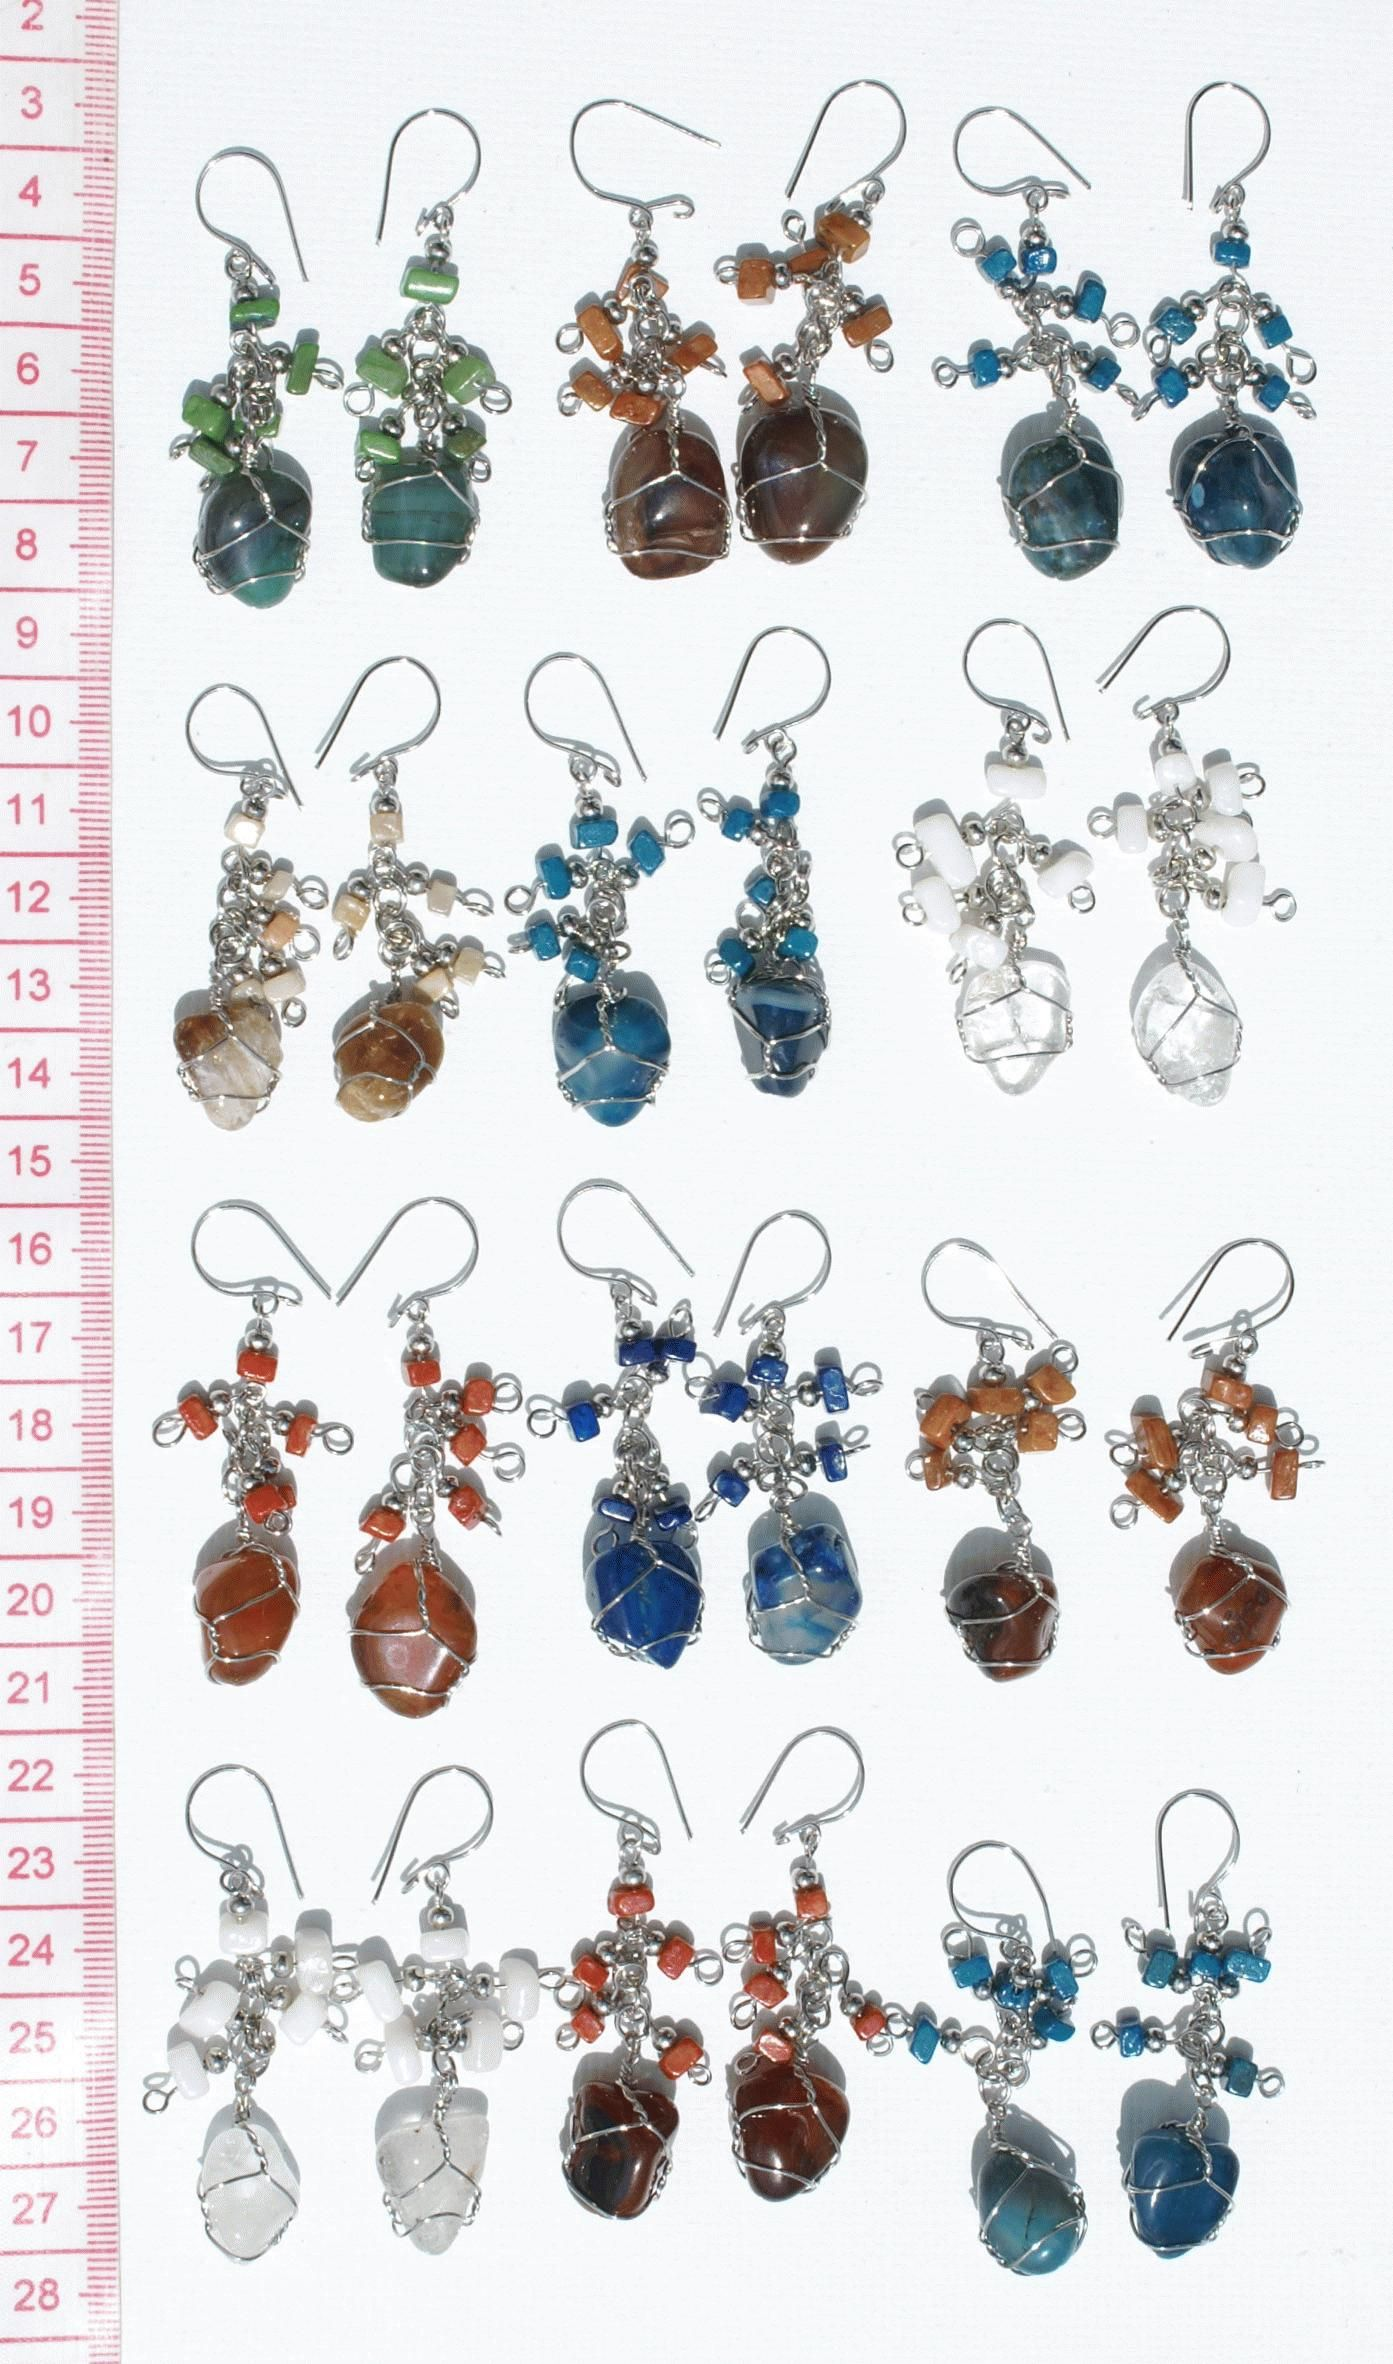 Lot 10 Pairs Peruvian Natural Piedra Stones Earrings South American Jewelry Peru